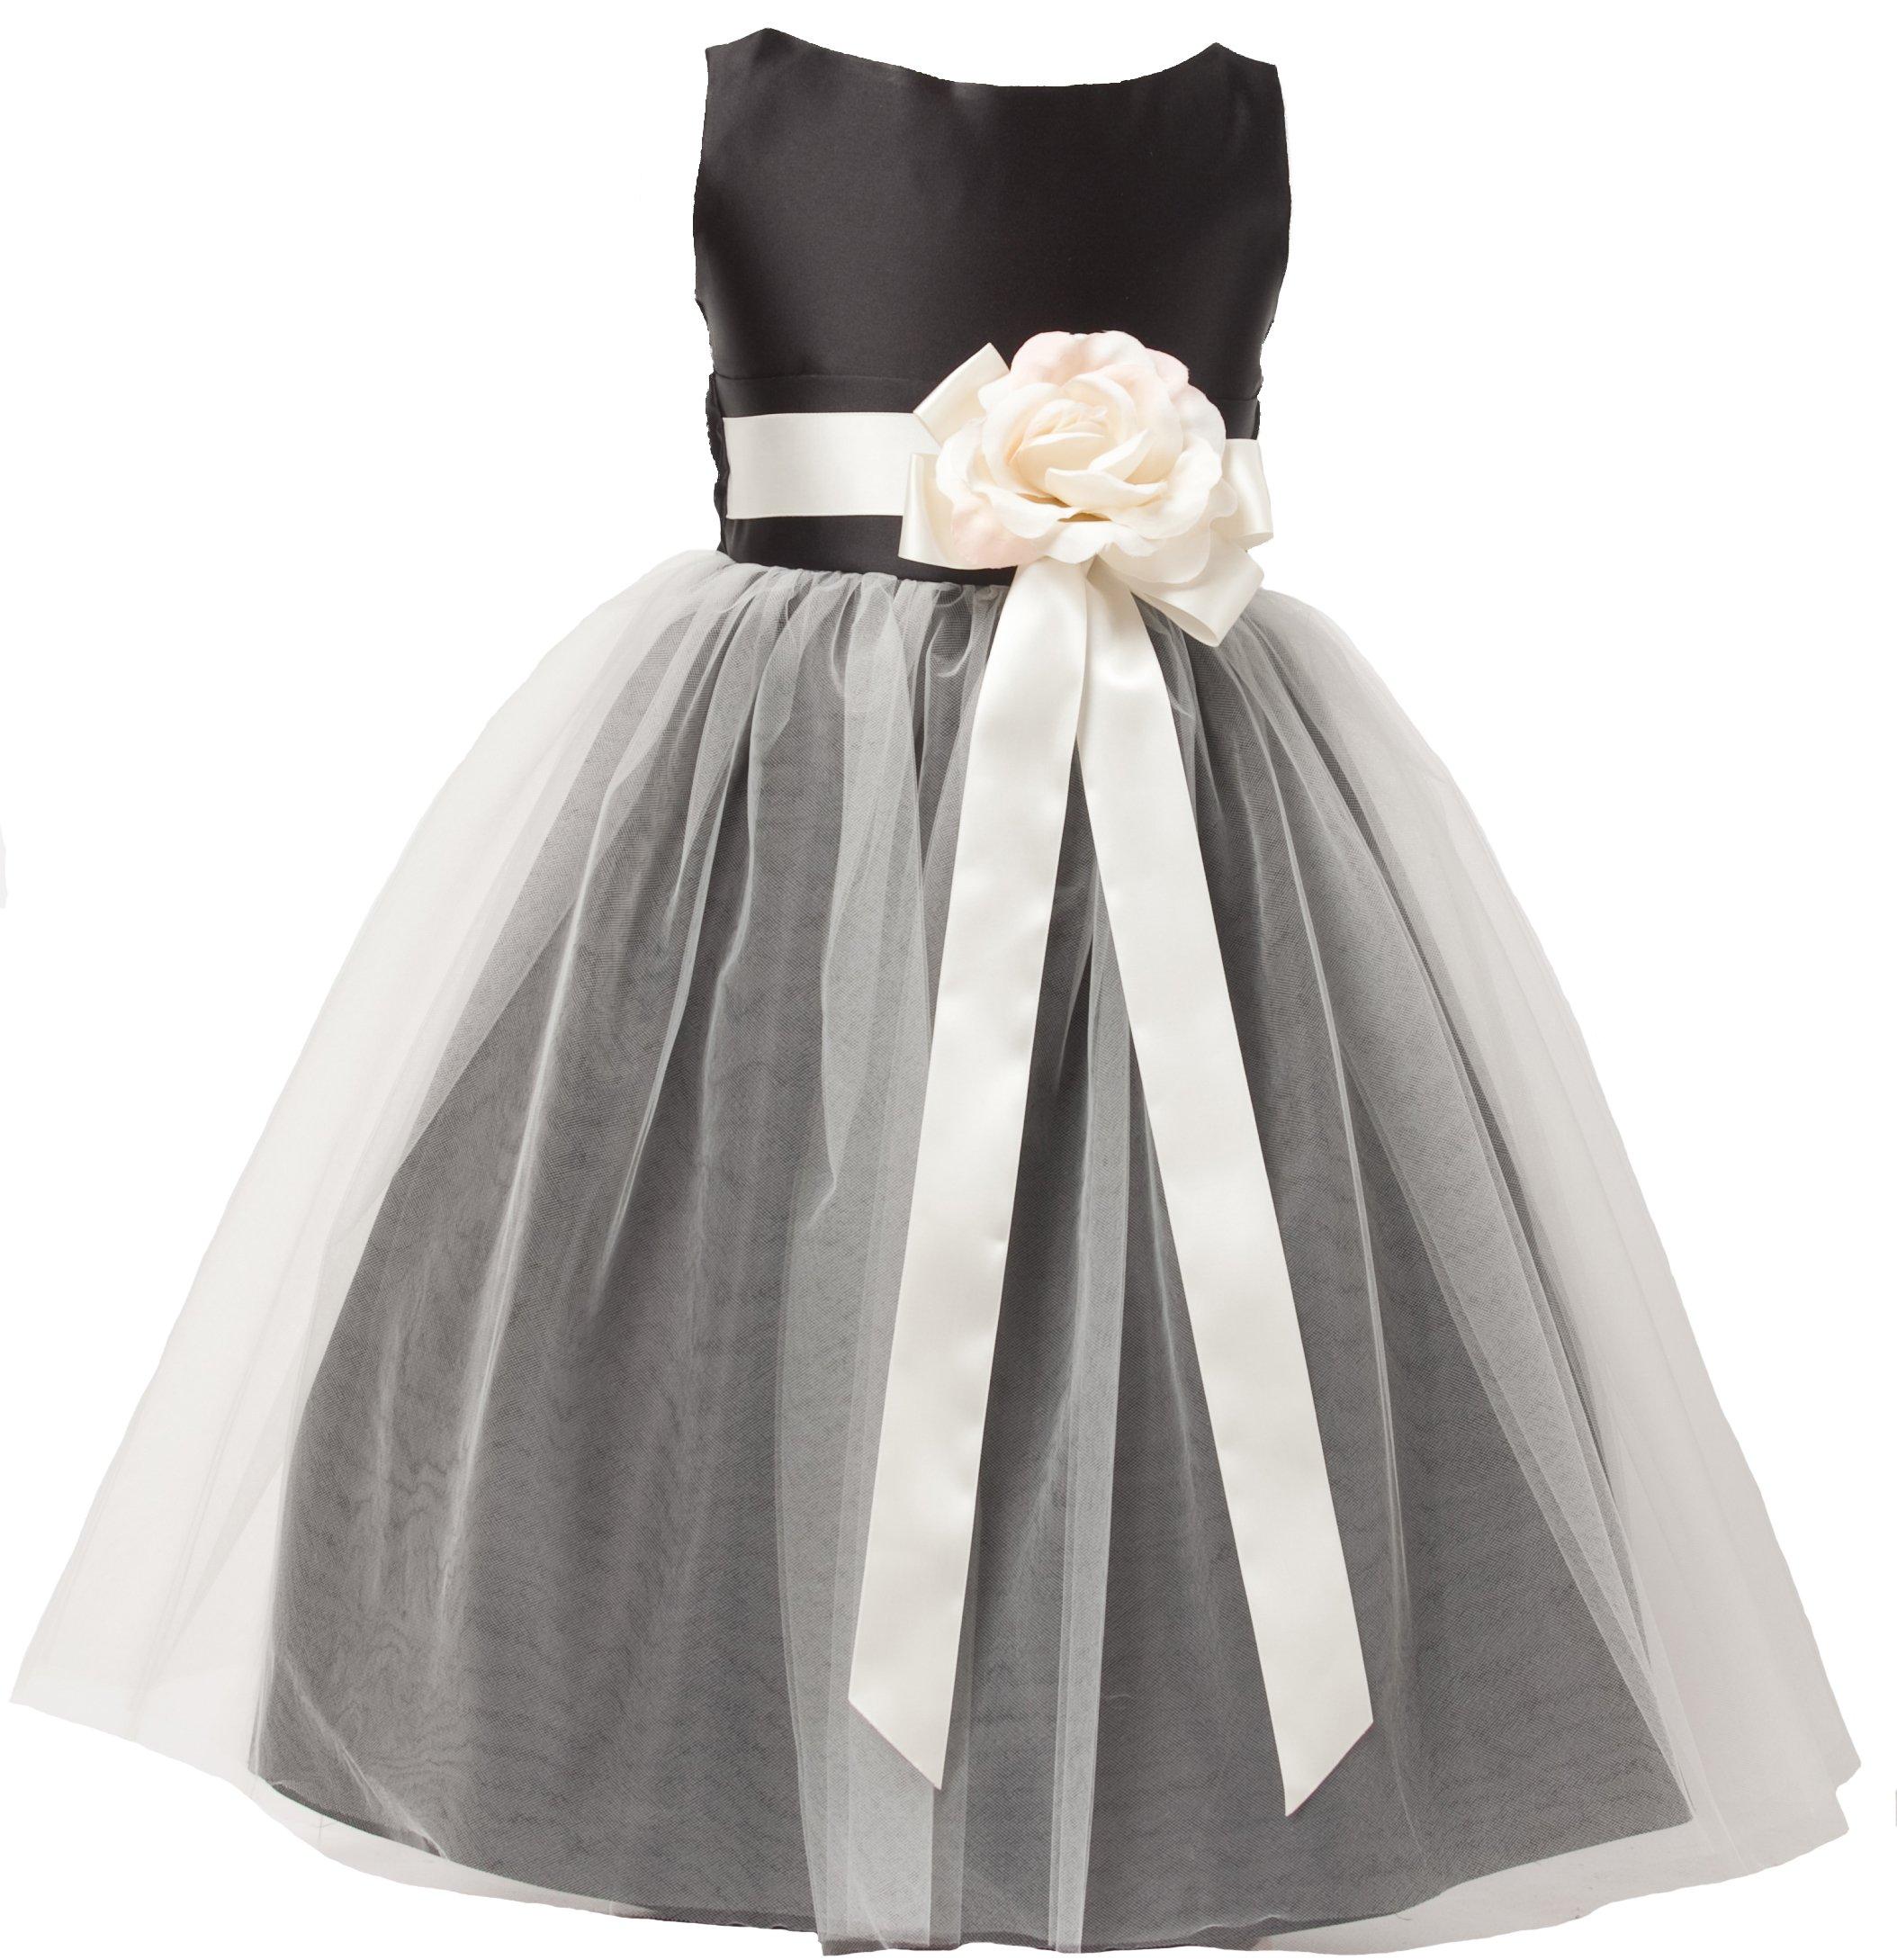 New Pink; Flower Print; Macy/'s Girls Adidas Sun Dress Set//Outfit - Sz 24 mo